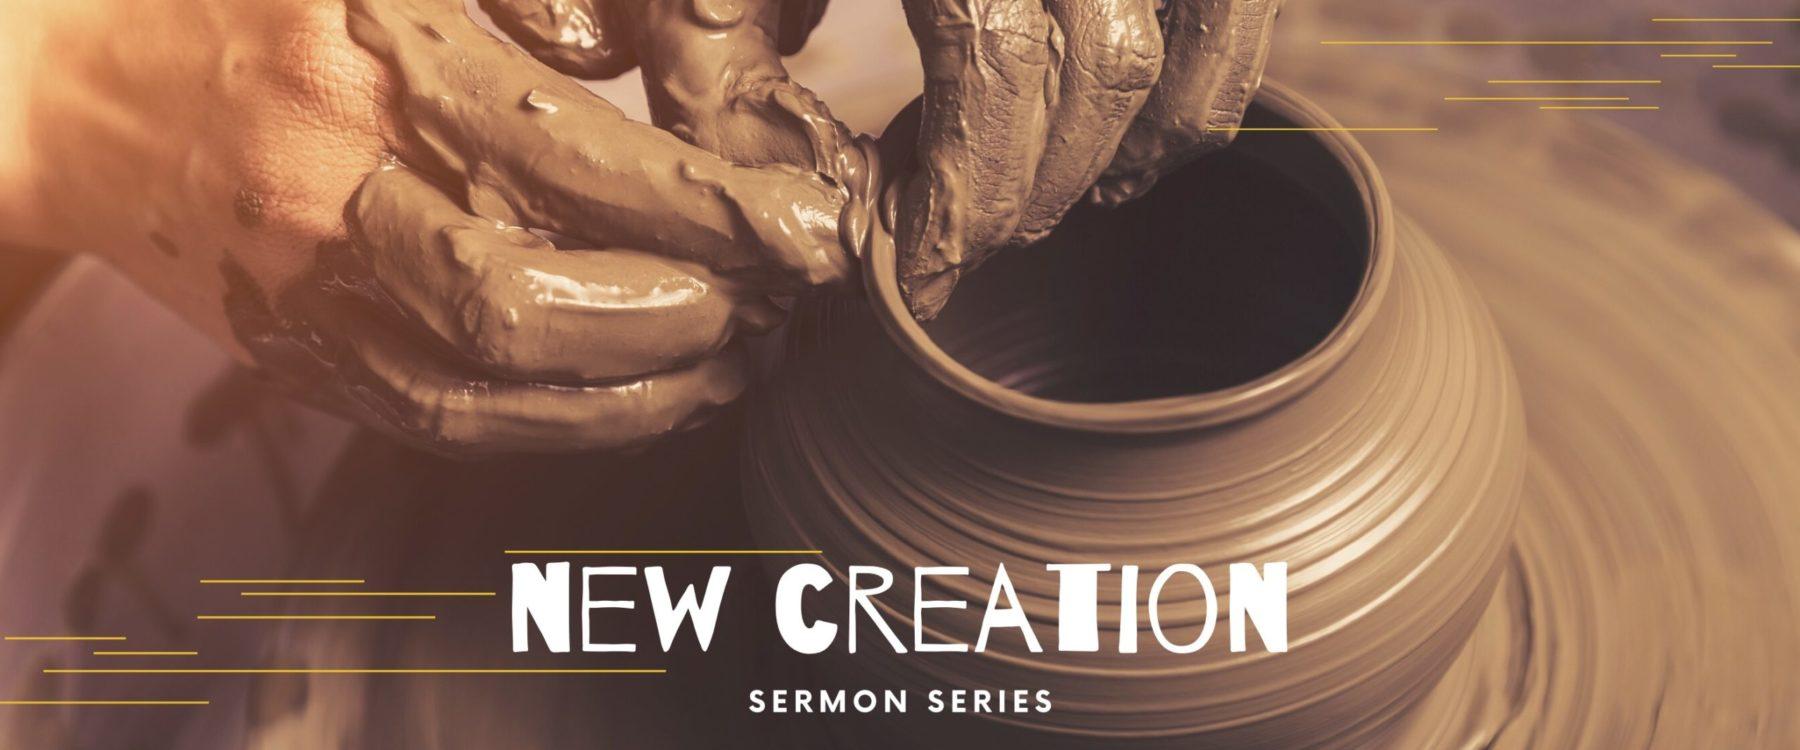 New Creation - Website